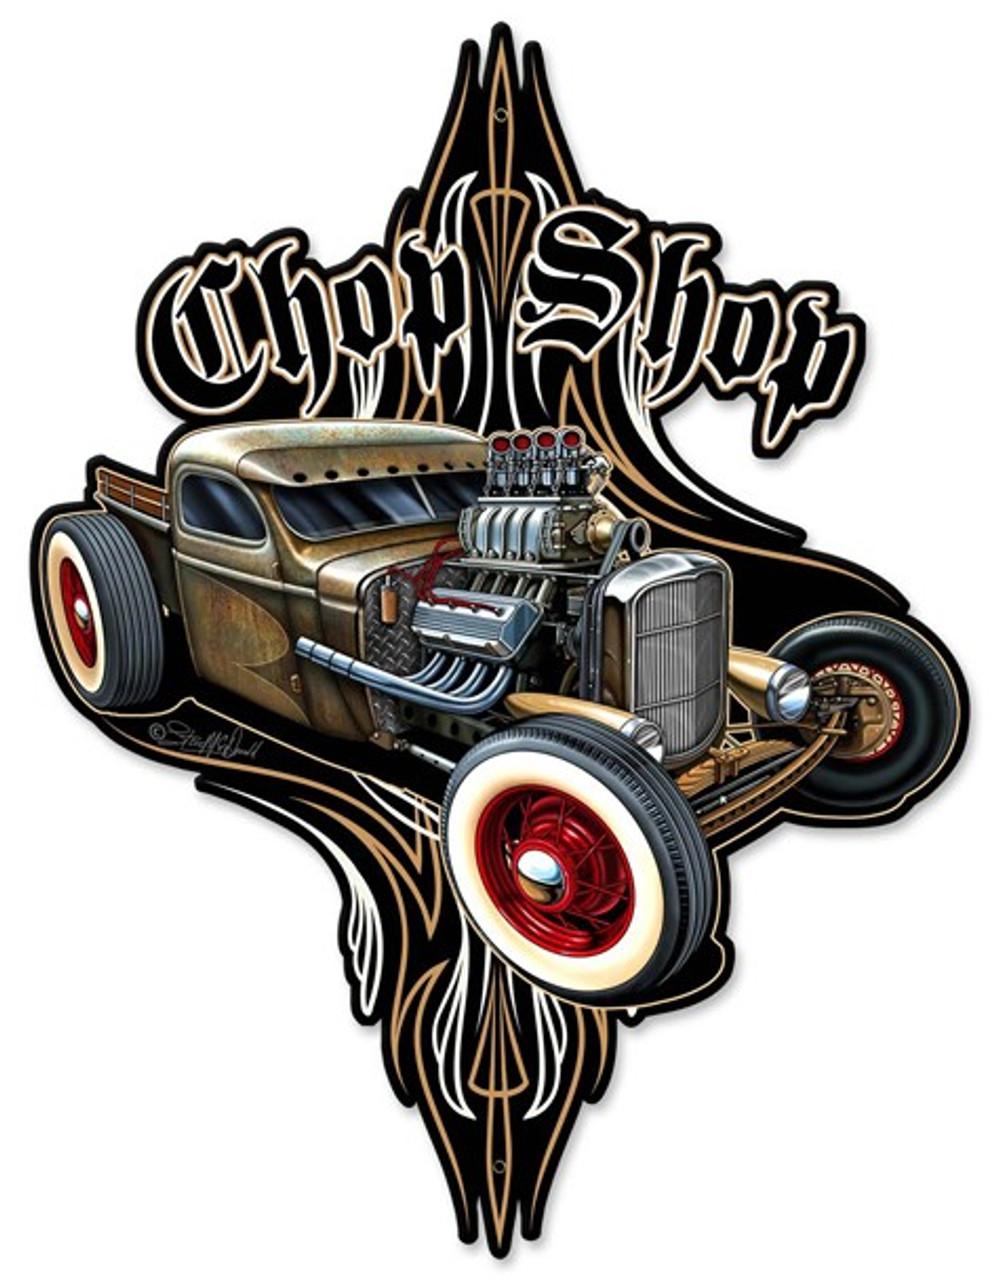 Rat Rod Chop Shop Metal Shape 14 x 18 Inches